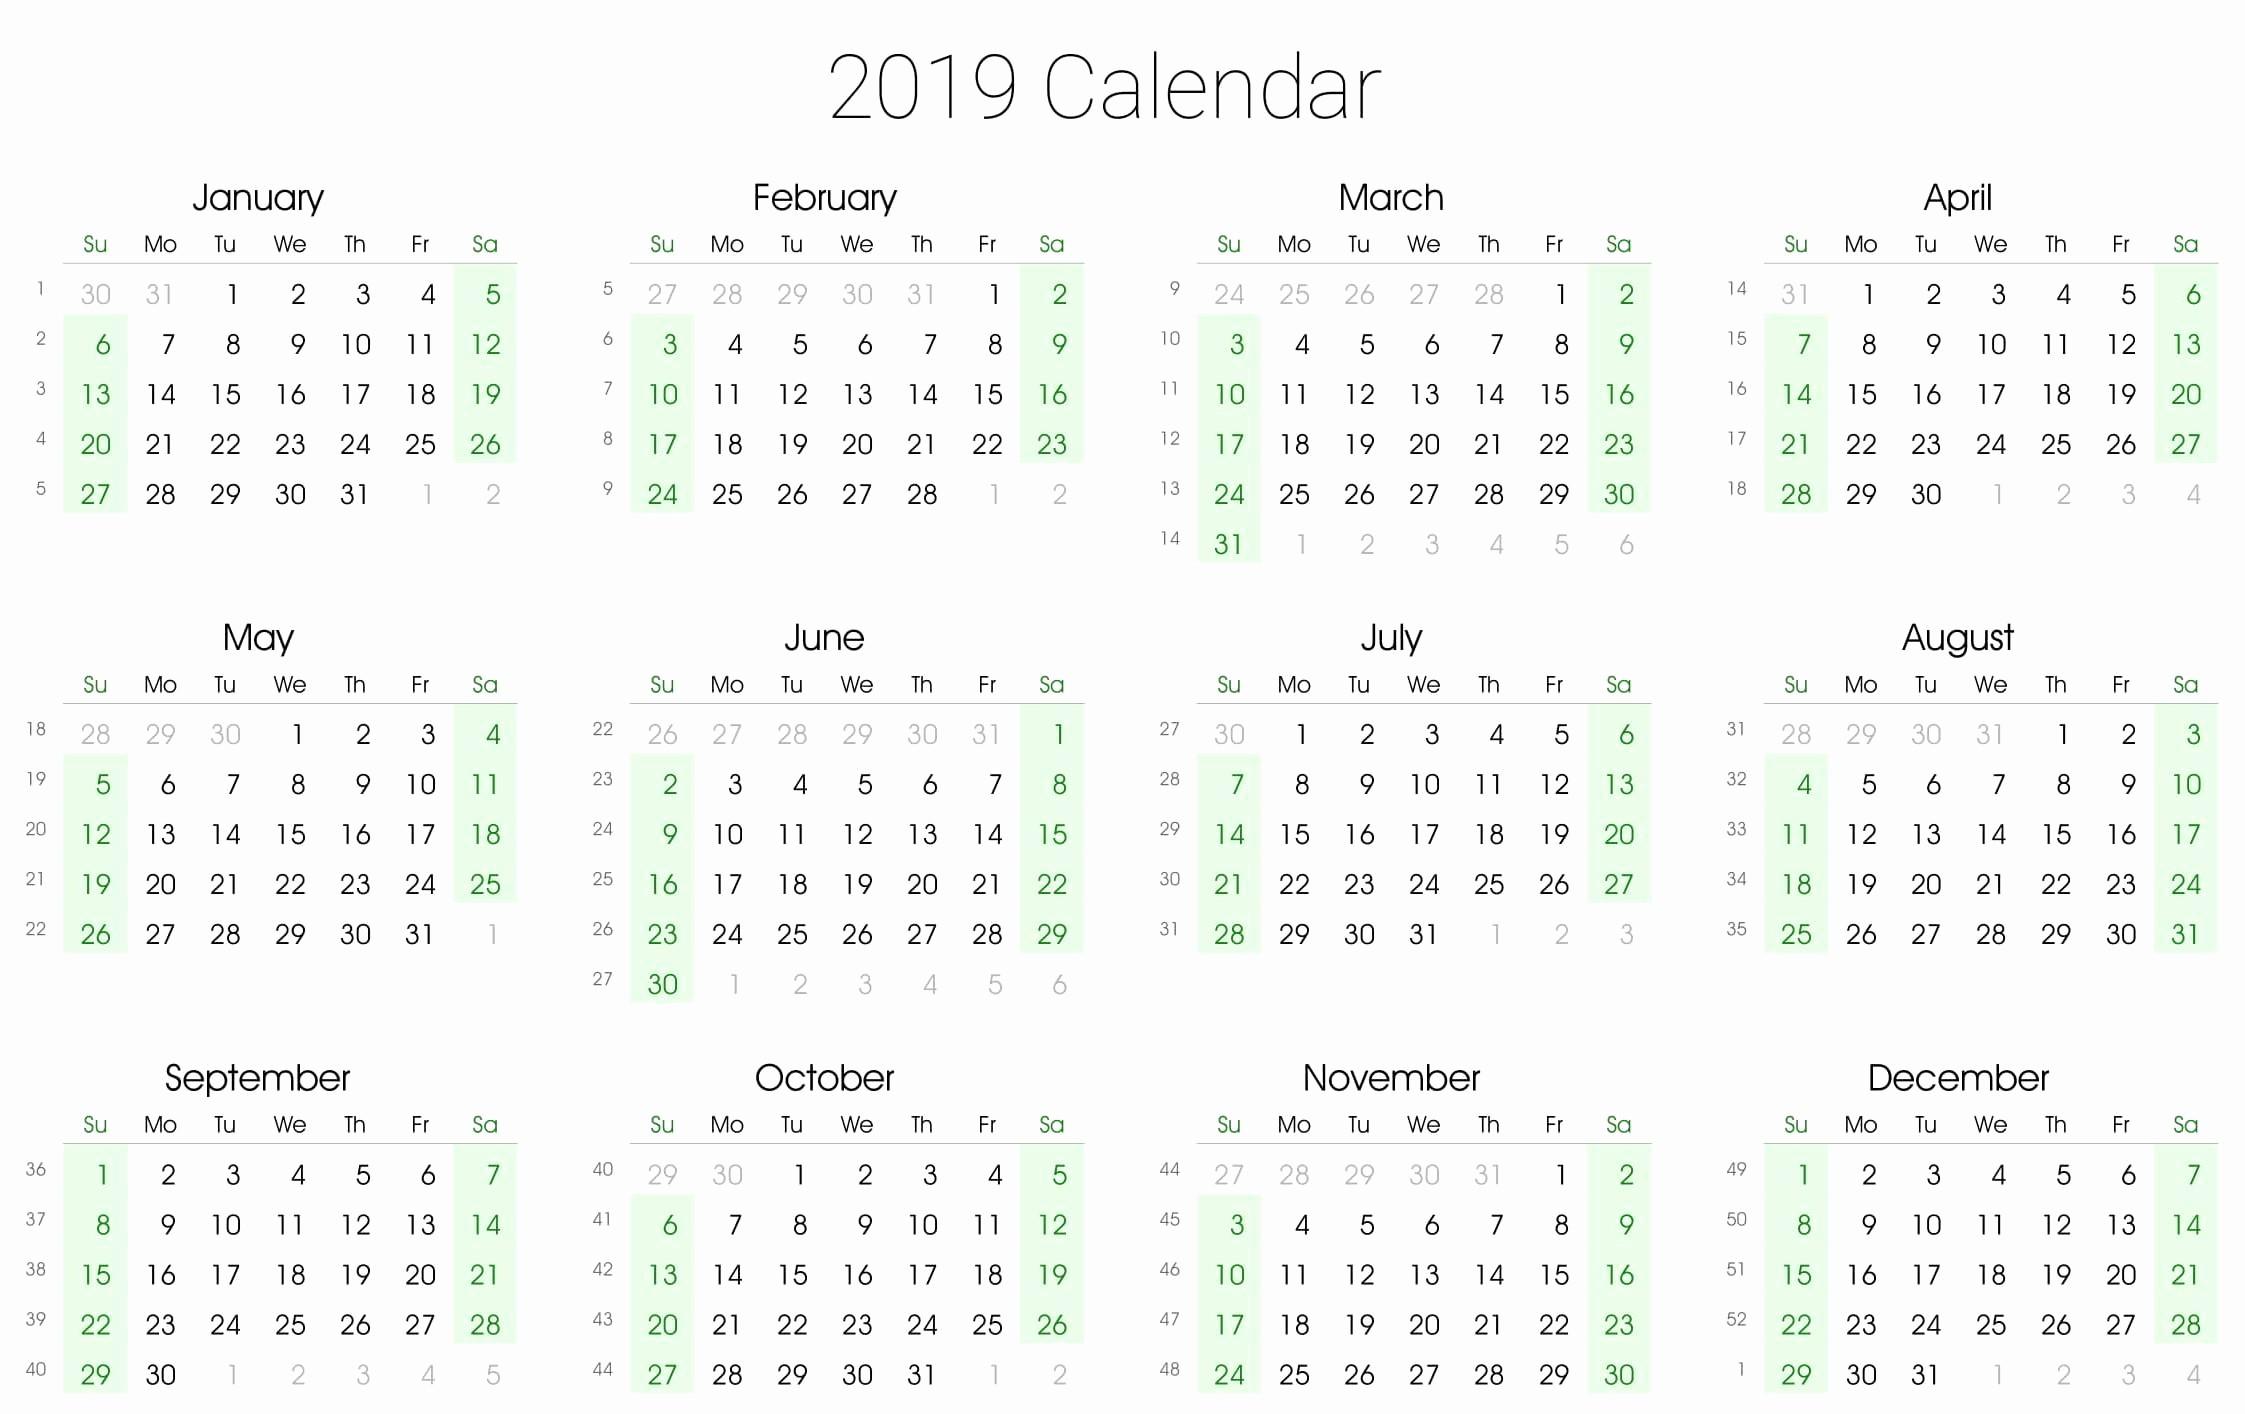 Annual Calendar at A Glance Luxury A4 Printable Yearly Calendar 2019